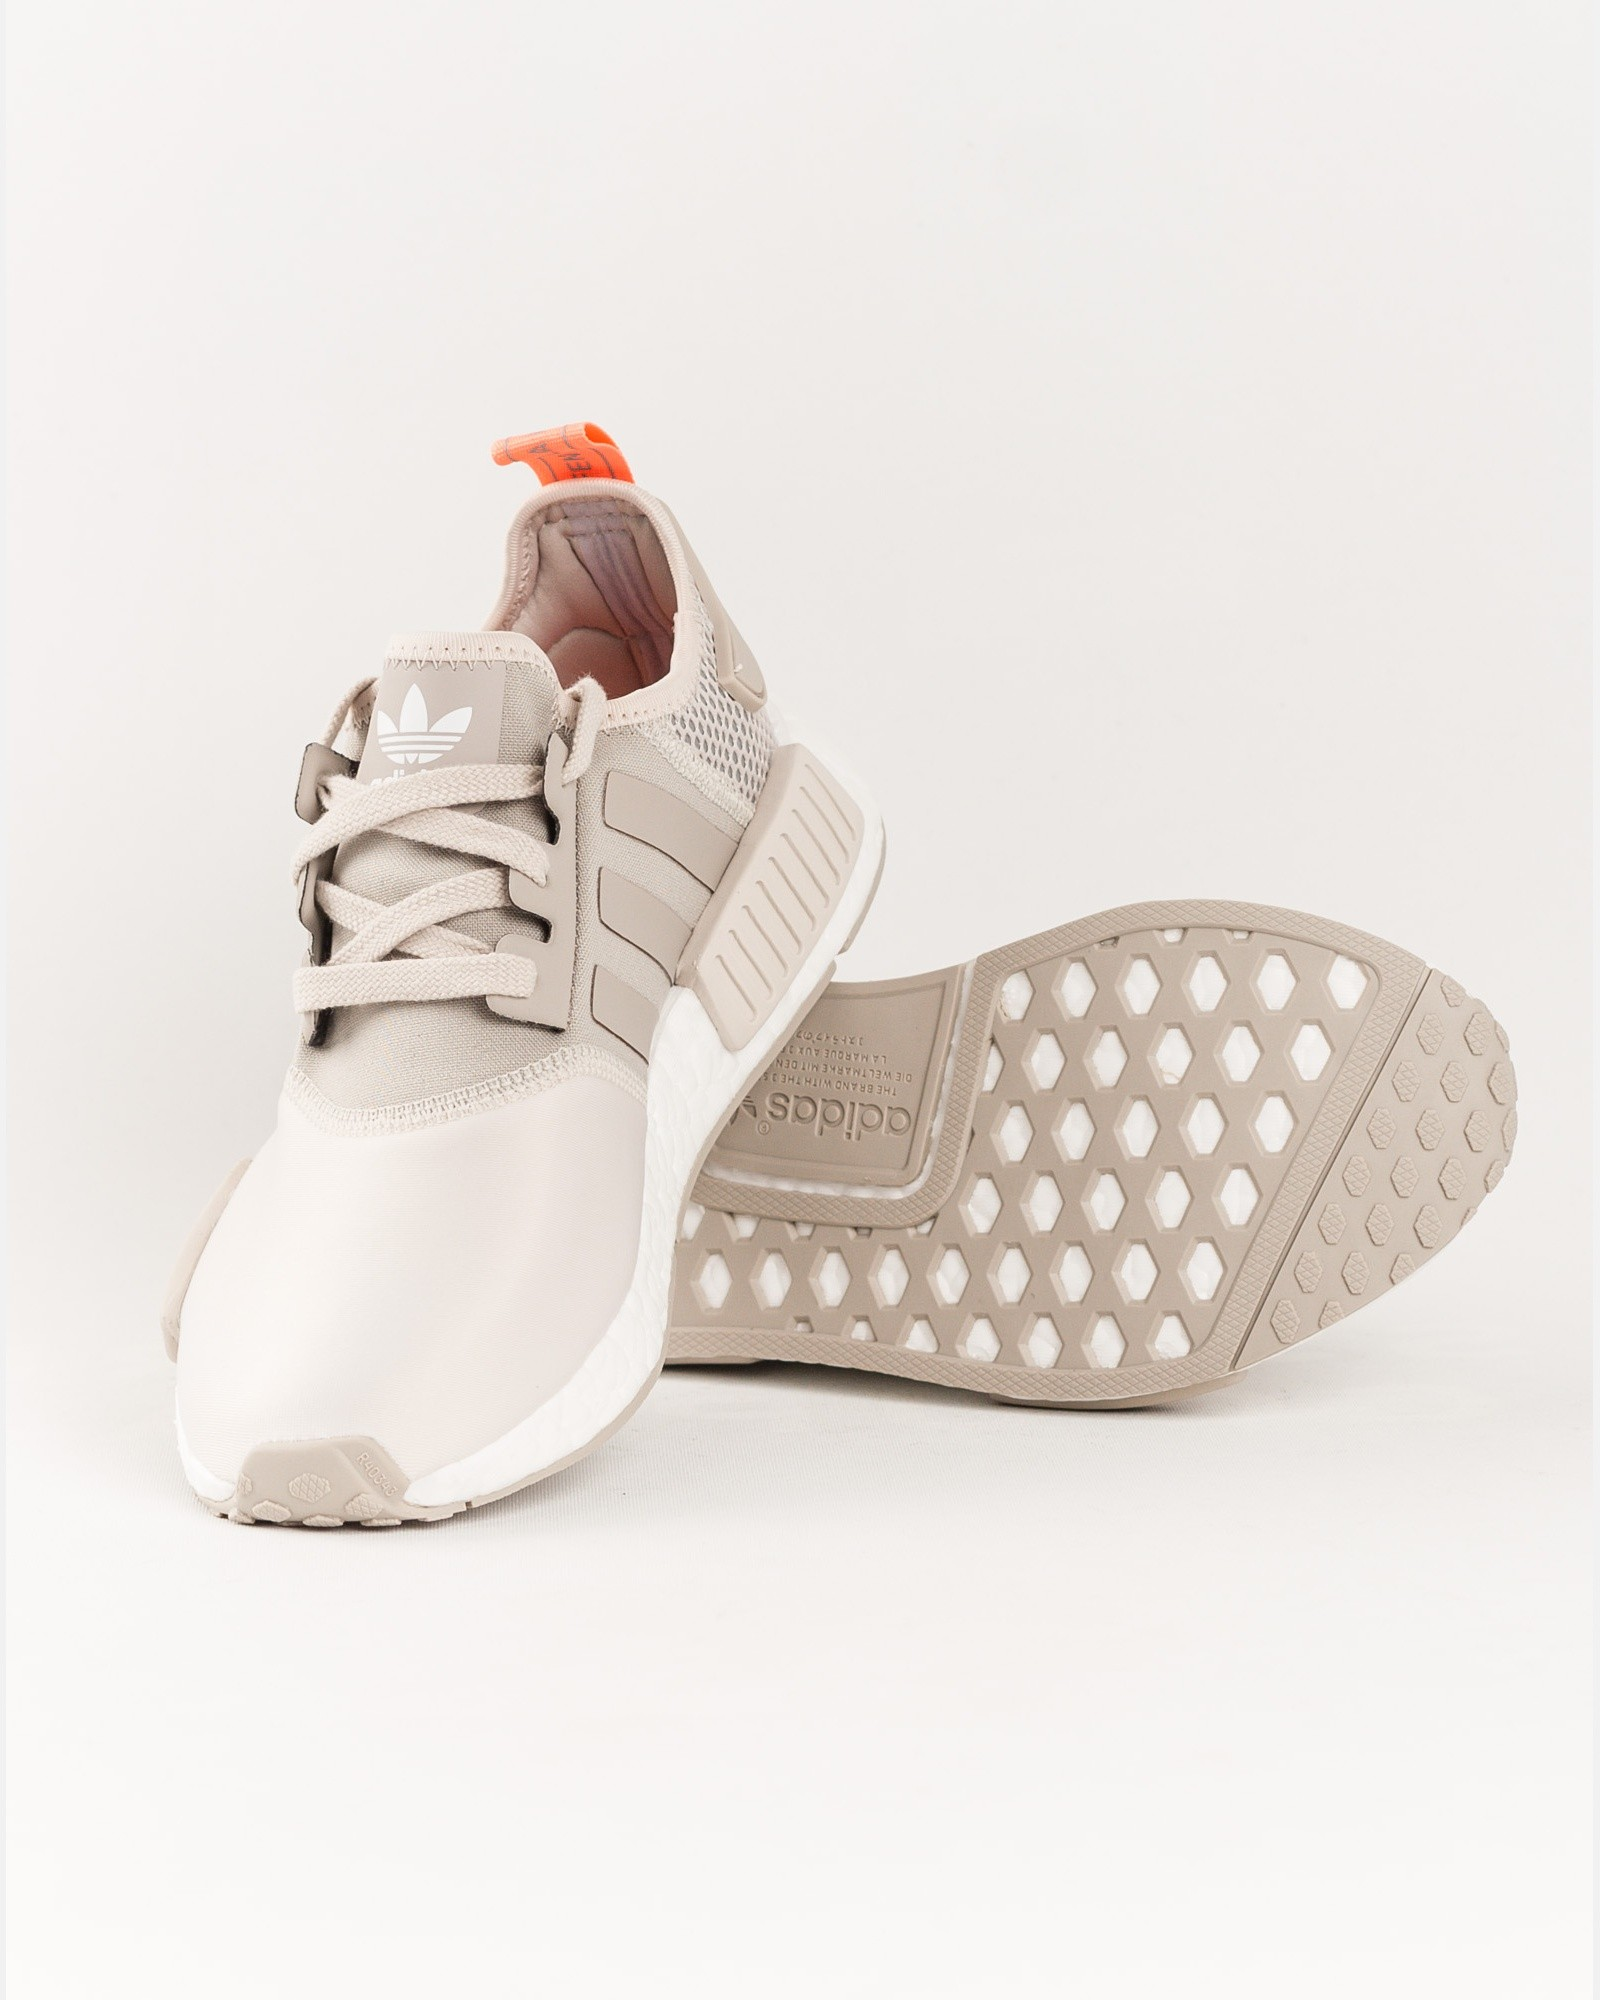 adidas nmd chaussure femmes